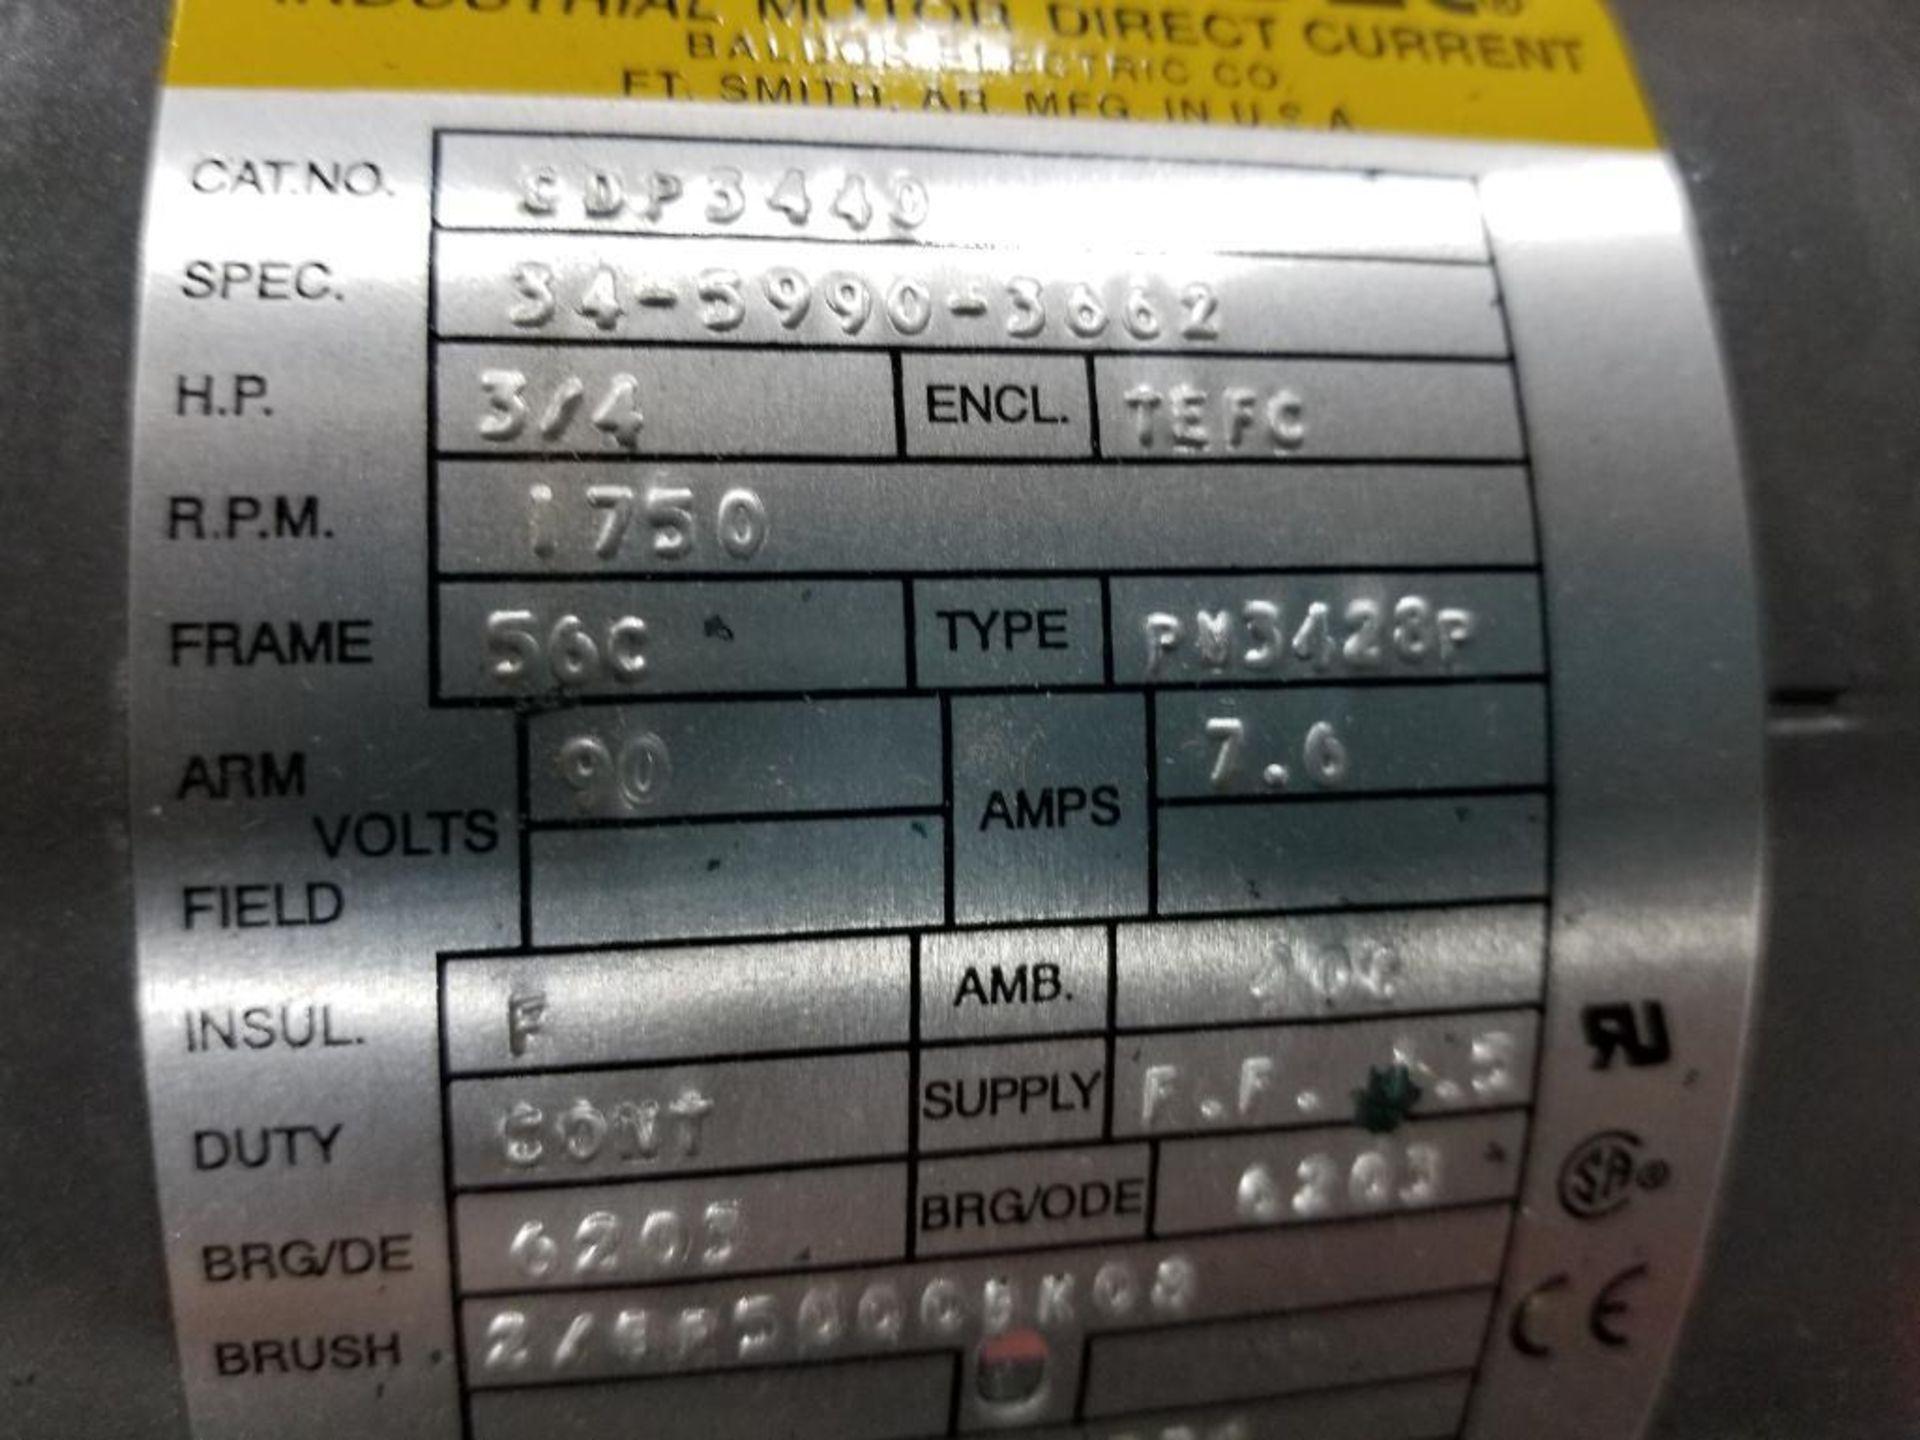 3/4HP Baldor industrial motor COP3440, 34-5990-3662. 1750RPM, 56C-Frame. - Image 3 of 5